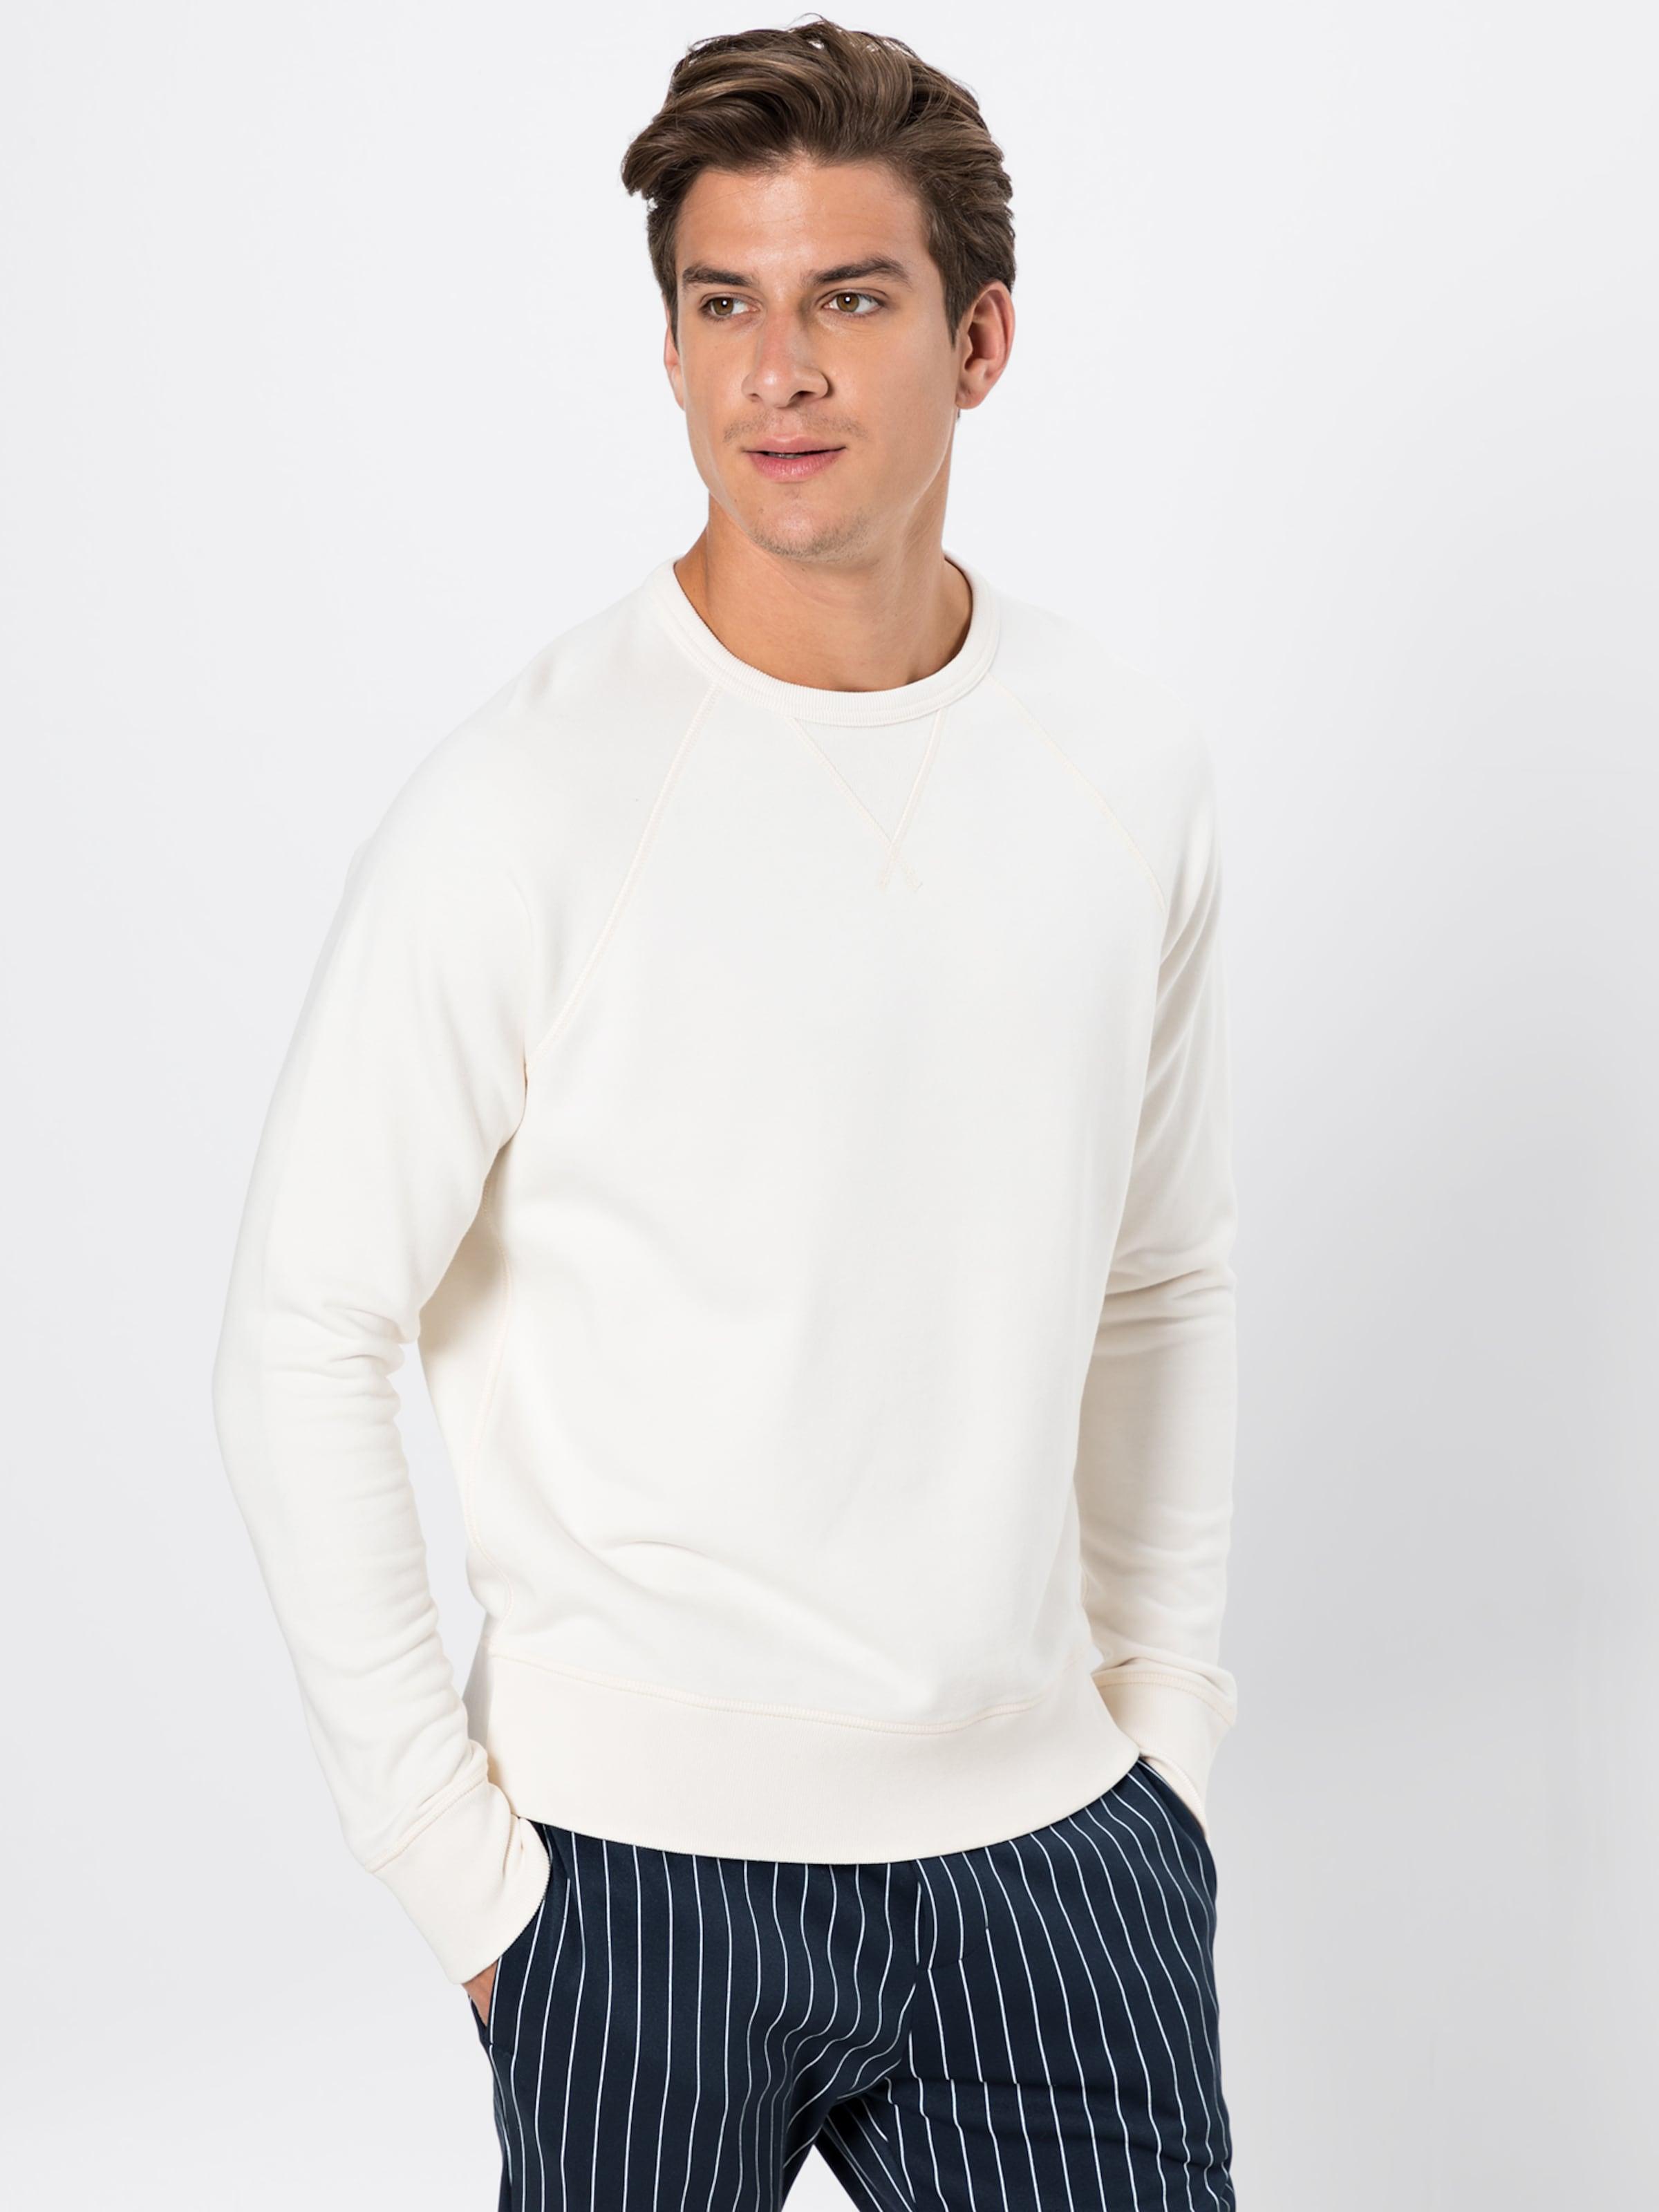 In Drykorn Sweatshirt In Drykorn Sweatshirt Weiß Sweatshirt Weiß 'razer' 'razer' Drykorn orBdCxe